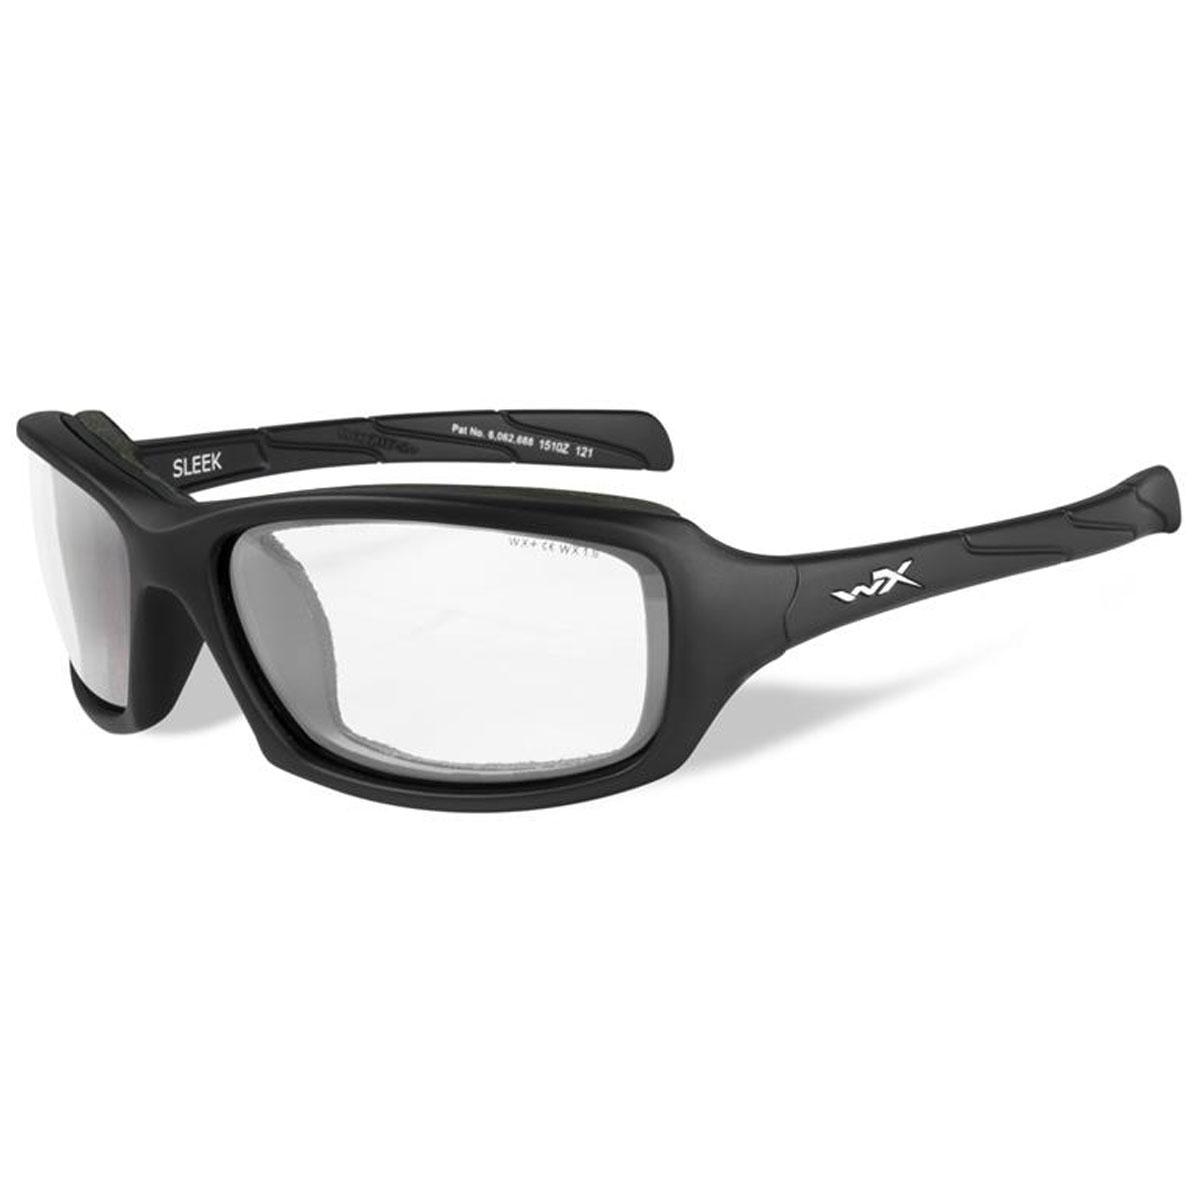 9841149c7d6e Wiley X Sleek Matte Black Sunglasses with Clear Lens - CCSLE03 ...